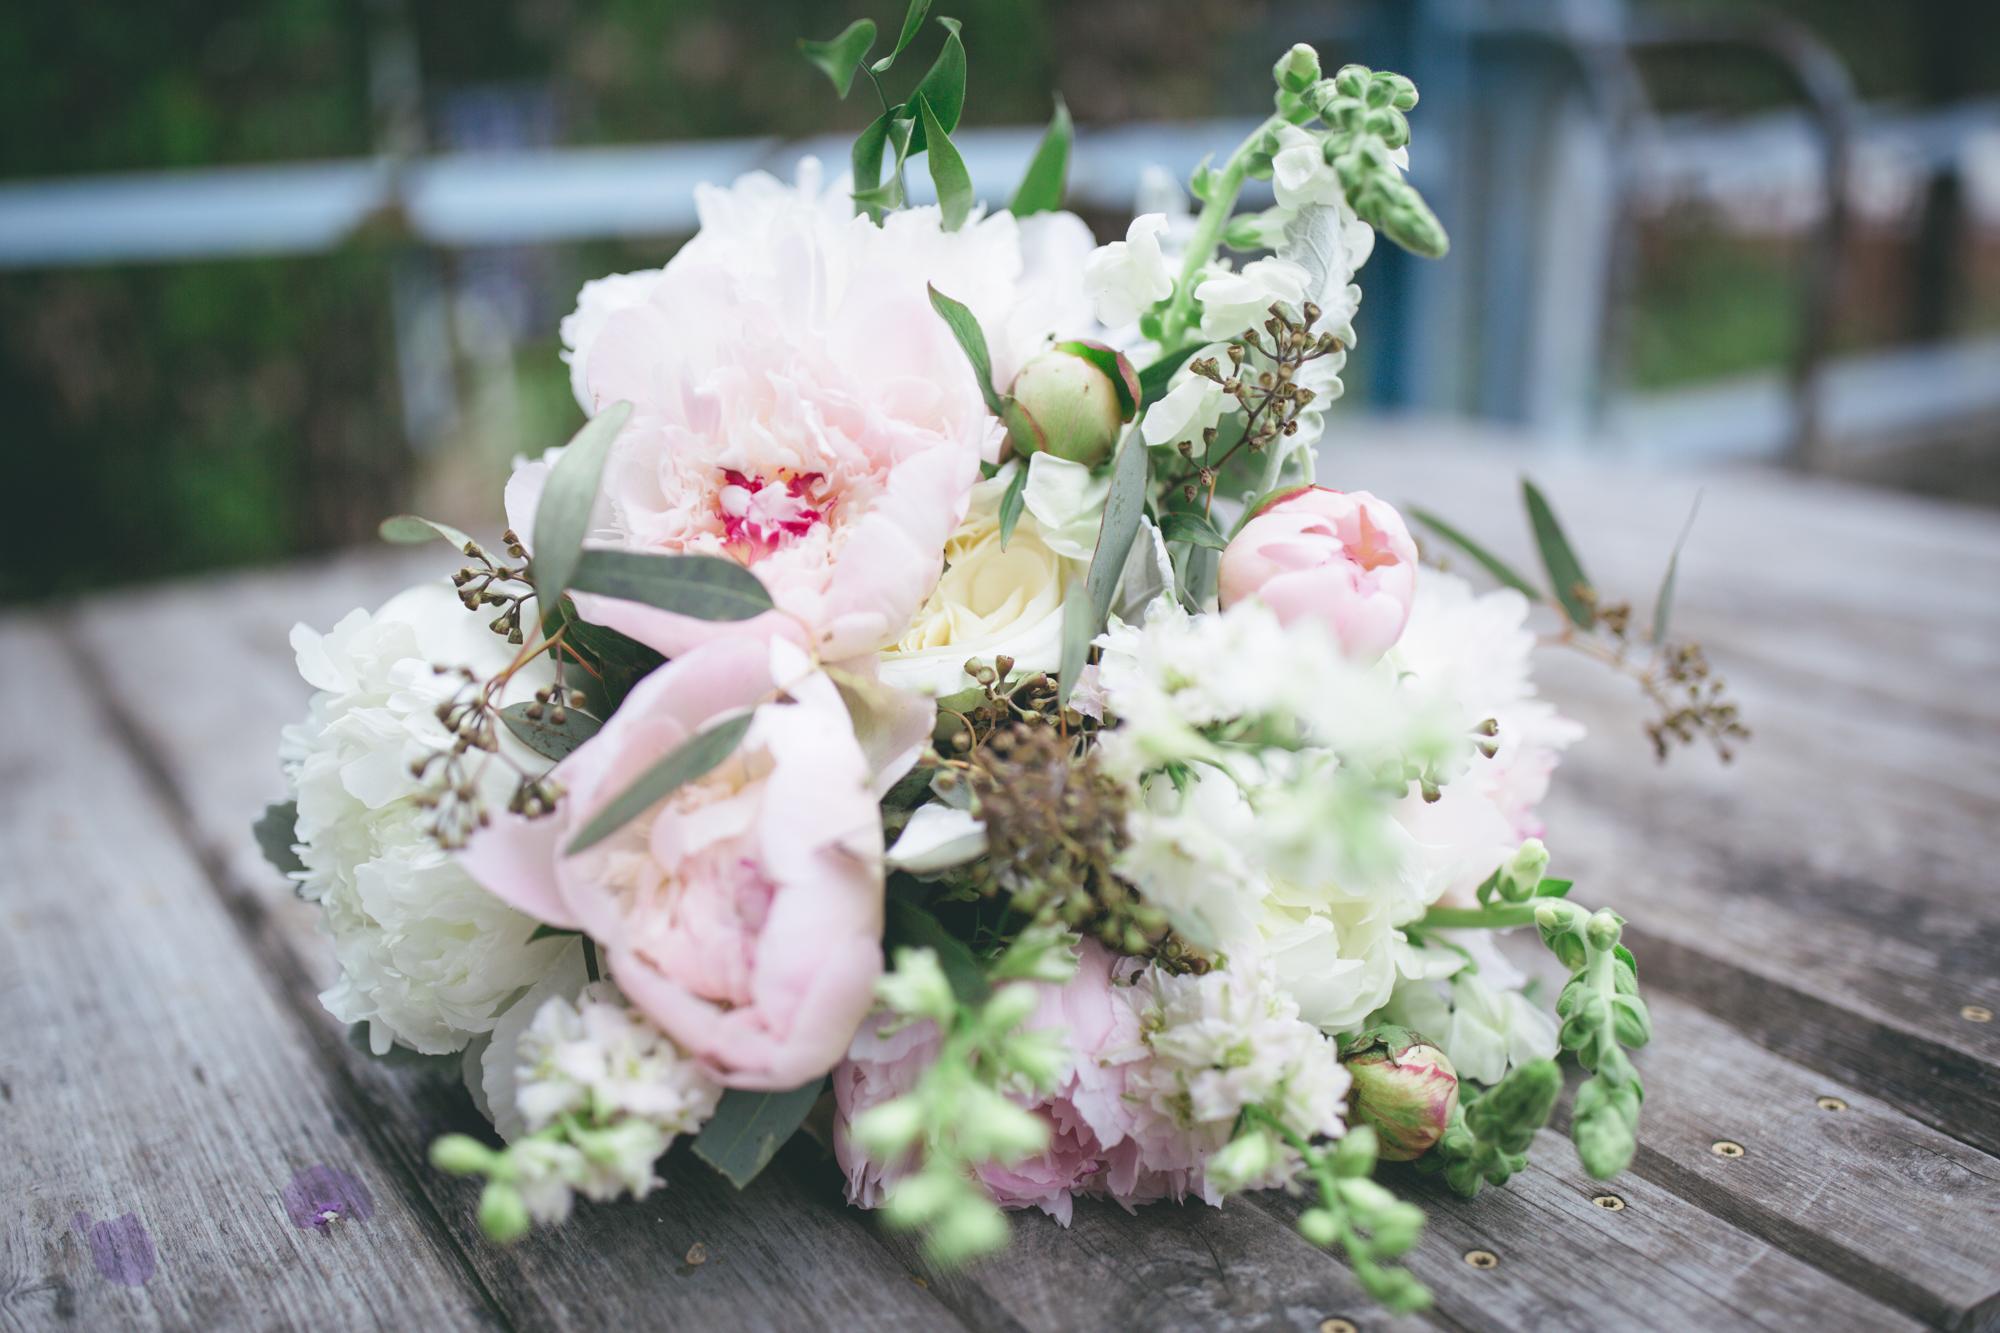 Aileen & Max | DC & Virginia Wedding Photographer | Maral Noori Photography | Blush Cream & Green Bouquet